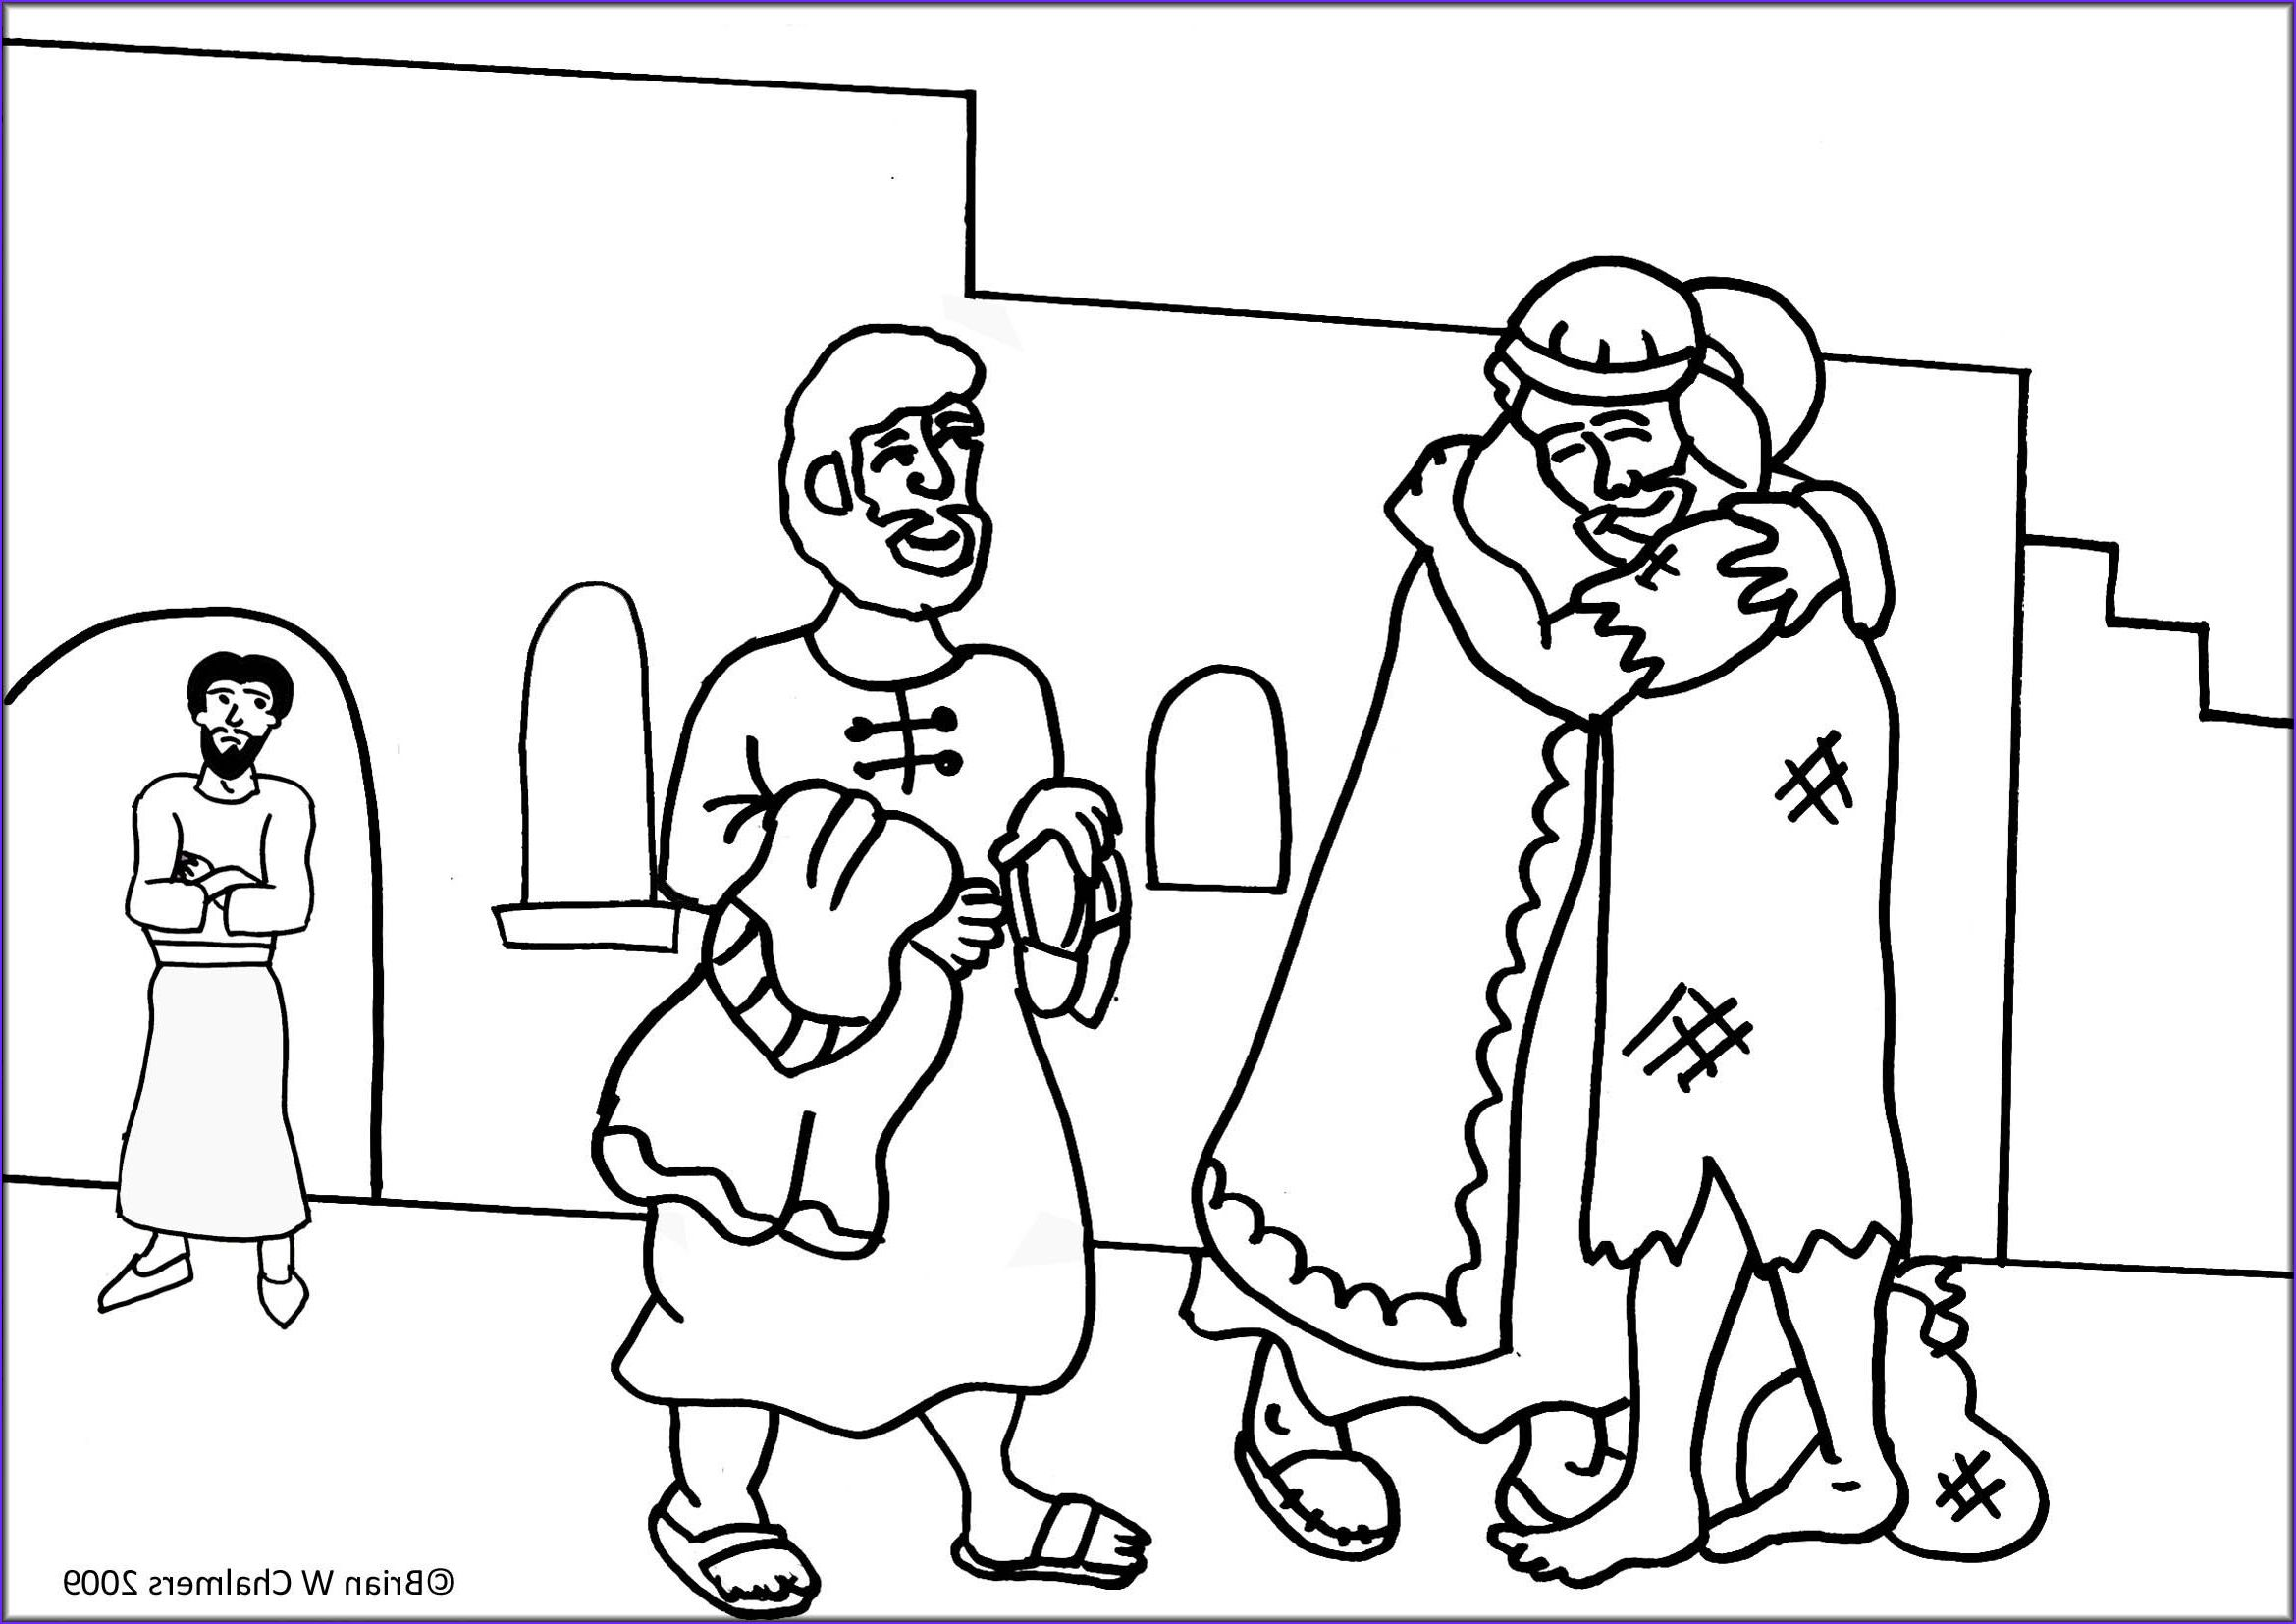 Image Coloring The Prodigal Sonصورة تلوين مثل الابن الضال عودة